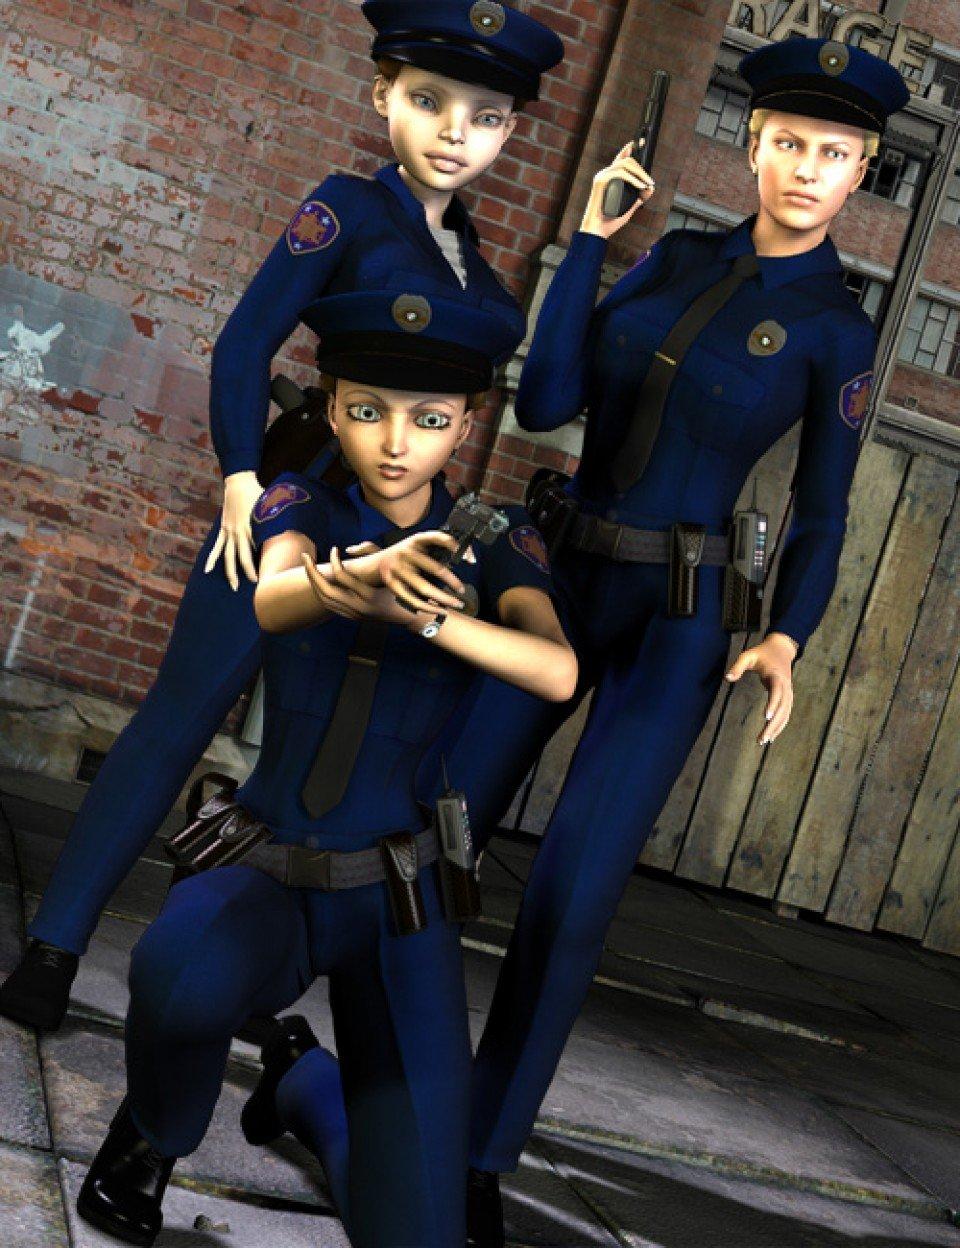 Real World Heroes Police Officer V4 A4 G4_DAZ3D下载站